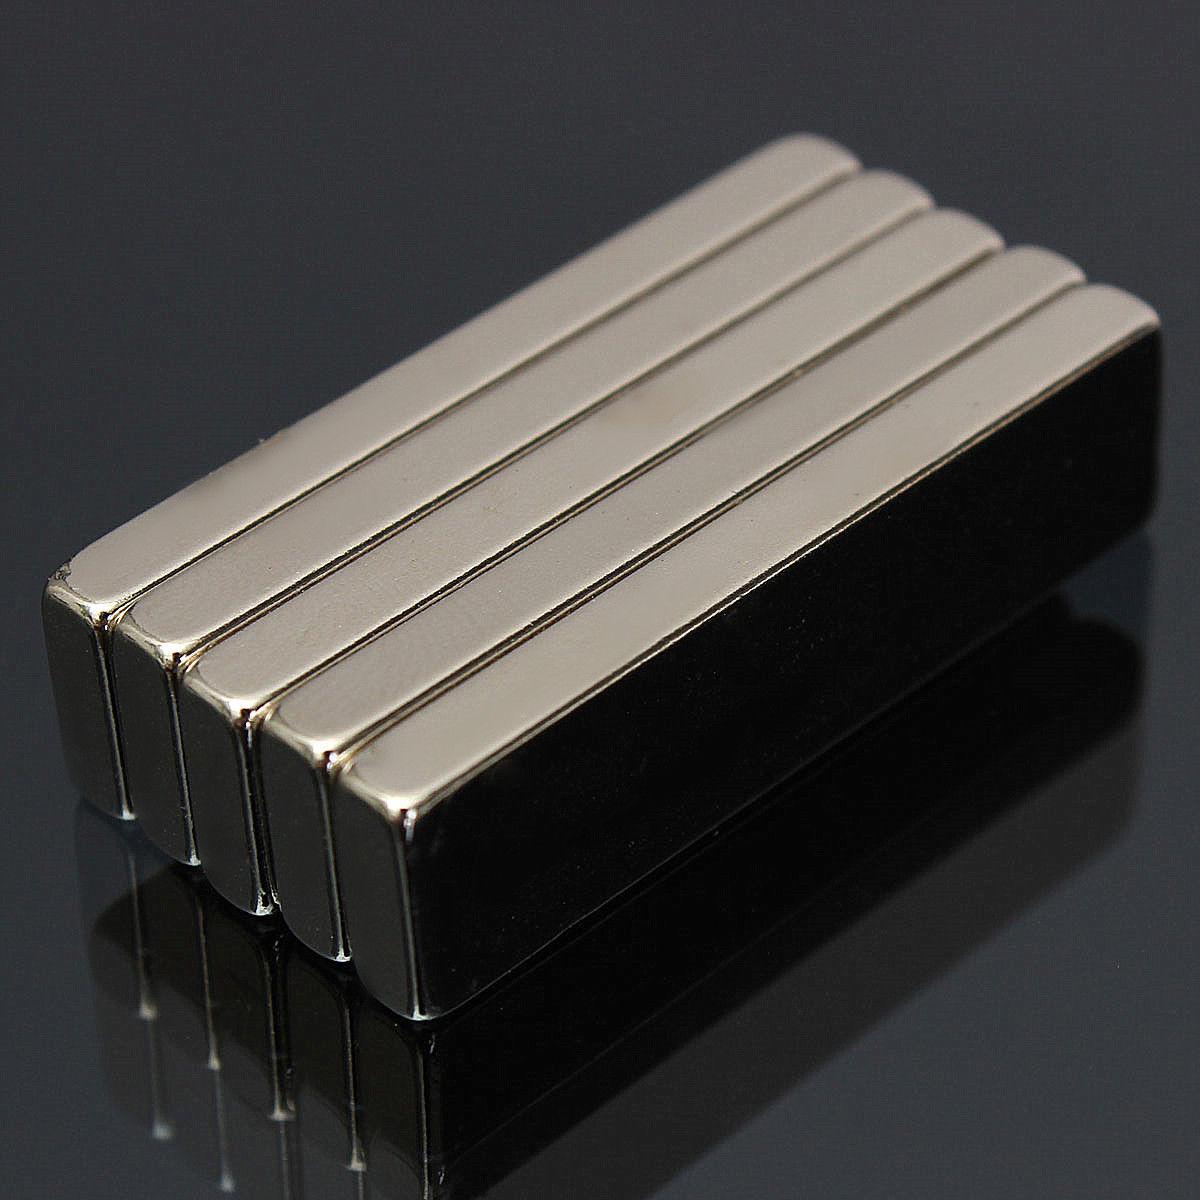 5Pcs 40x10x4mm N52 Strong Block Bar Fridge Rare Earth Neodymium Magnets New Oma